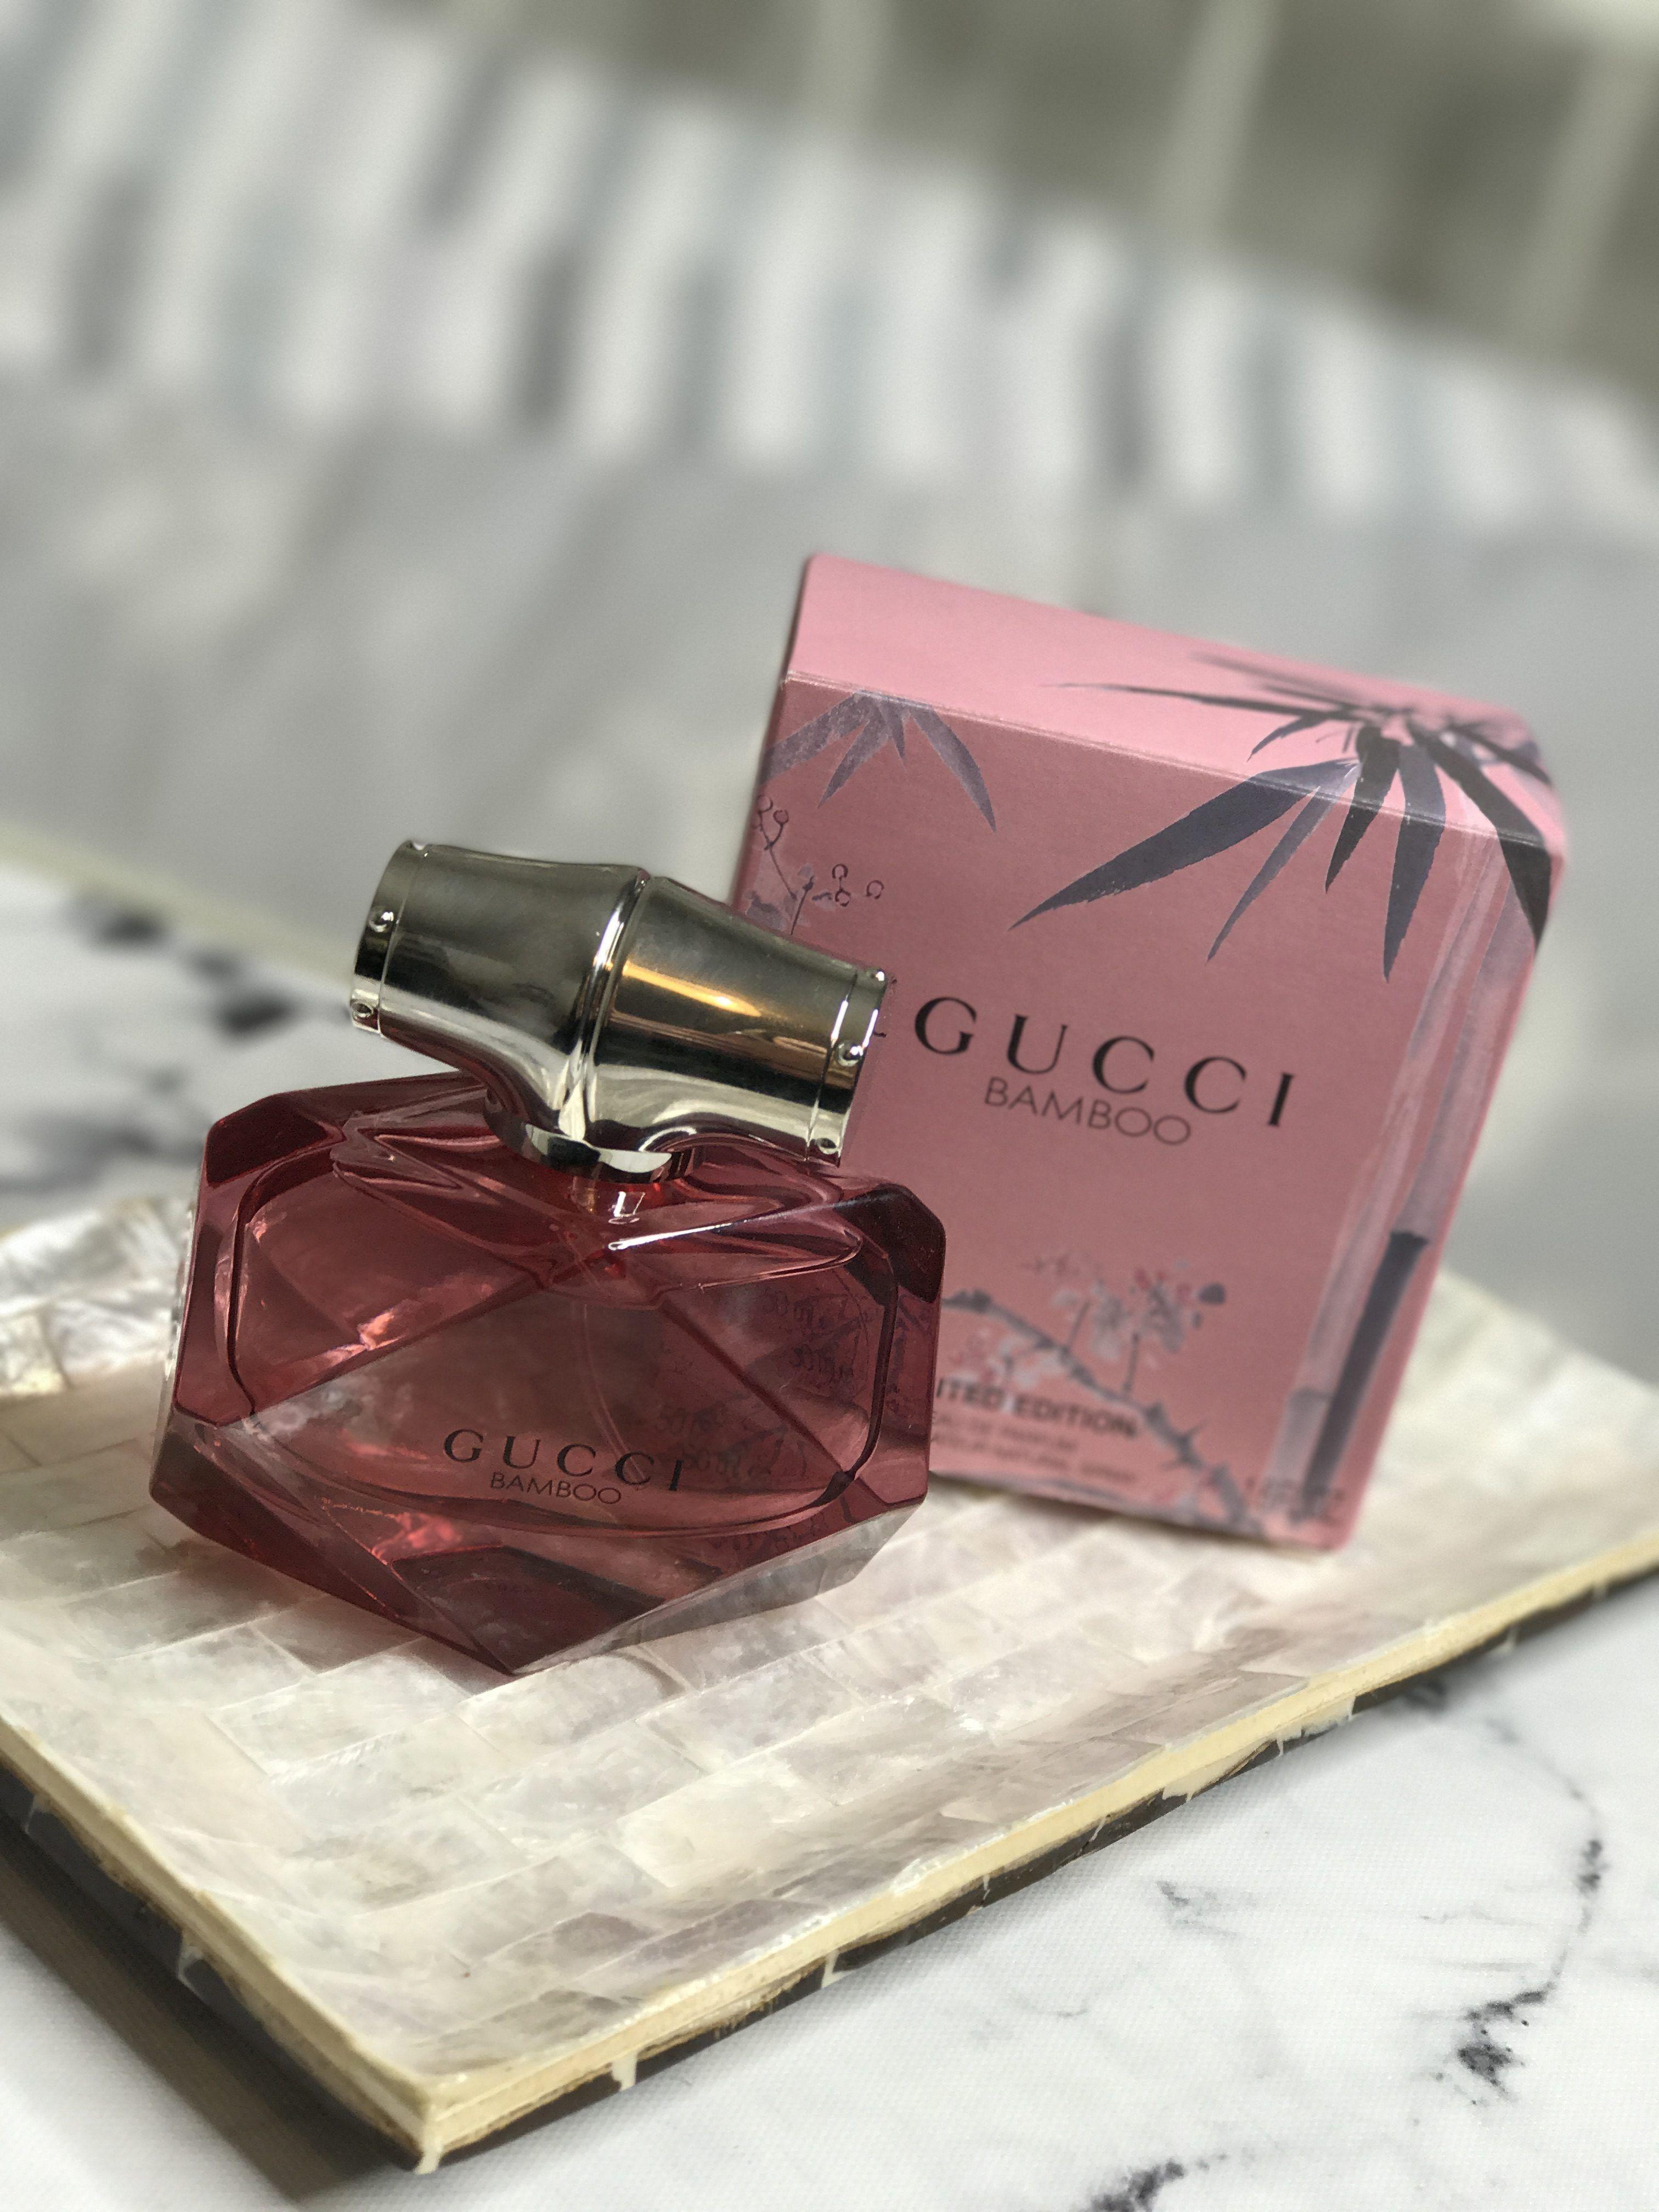 cbf18dfc1 Gucci Bamboo Limited Edition Fragrance | Духи | Gucci bamboo ...